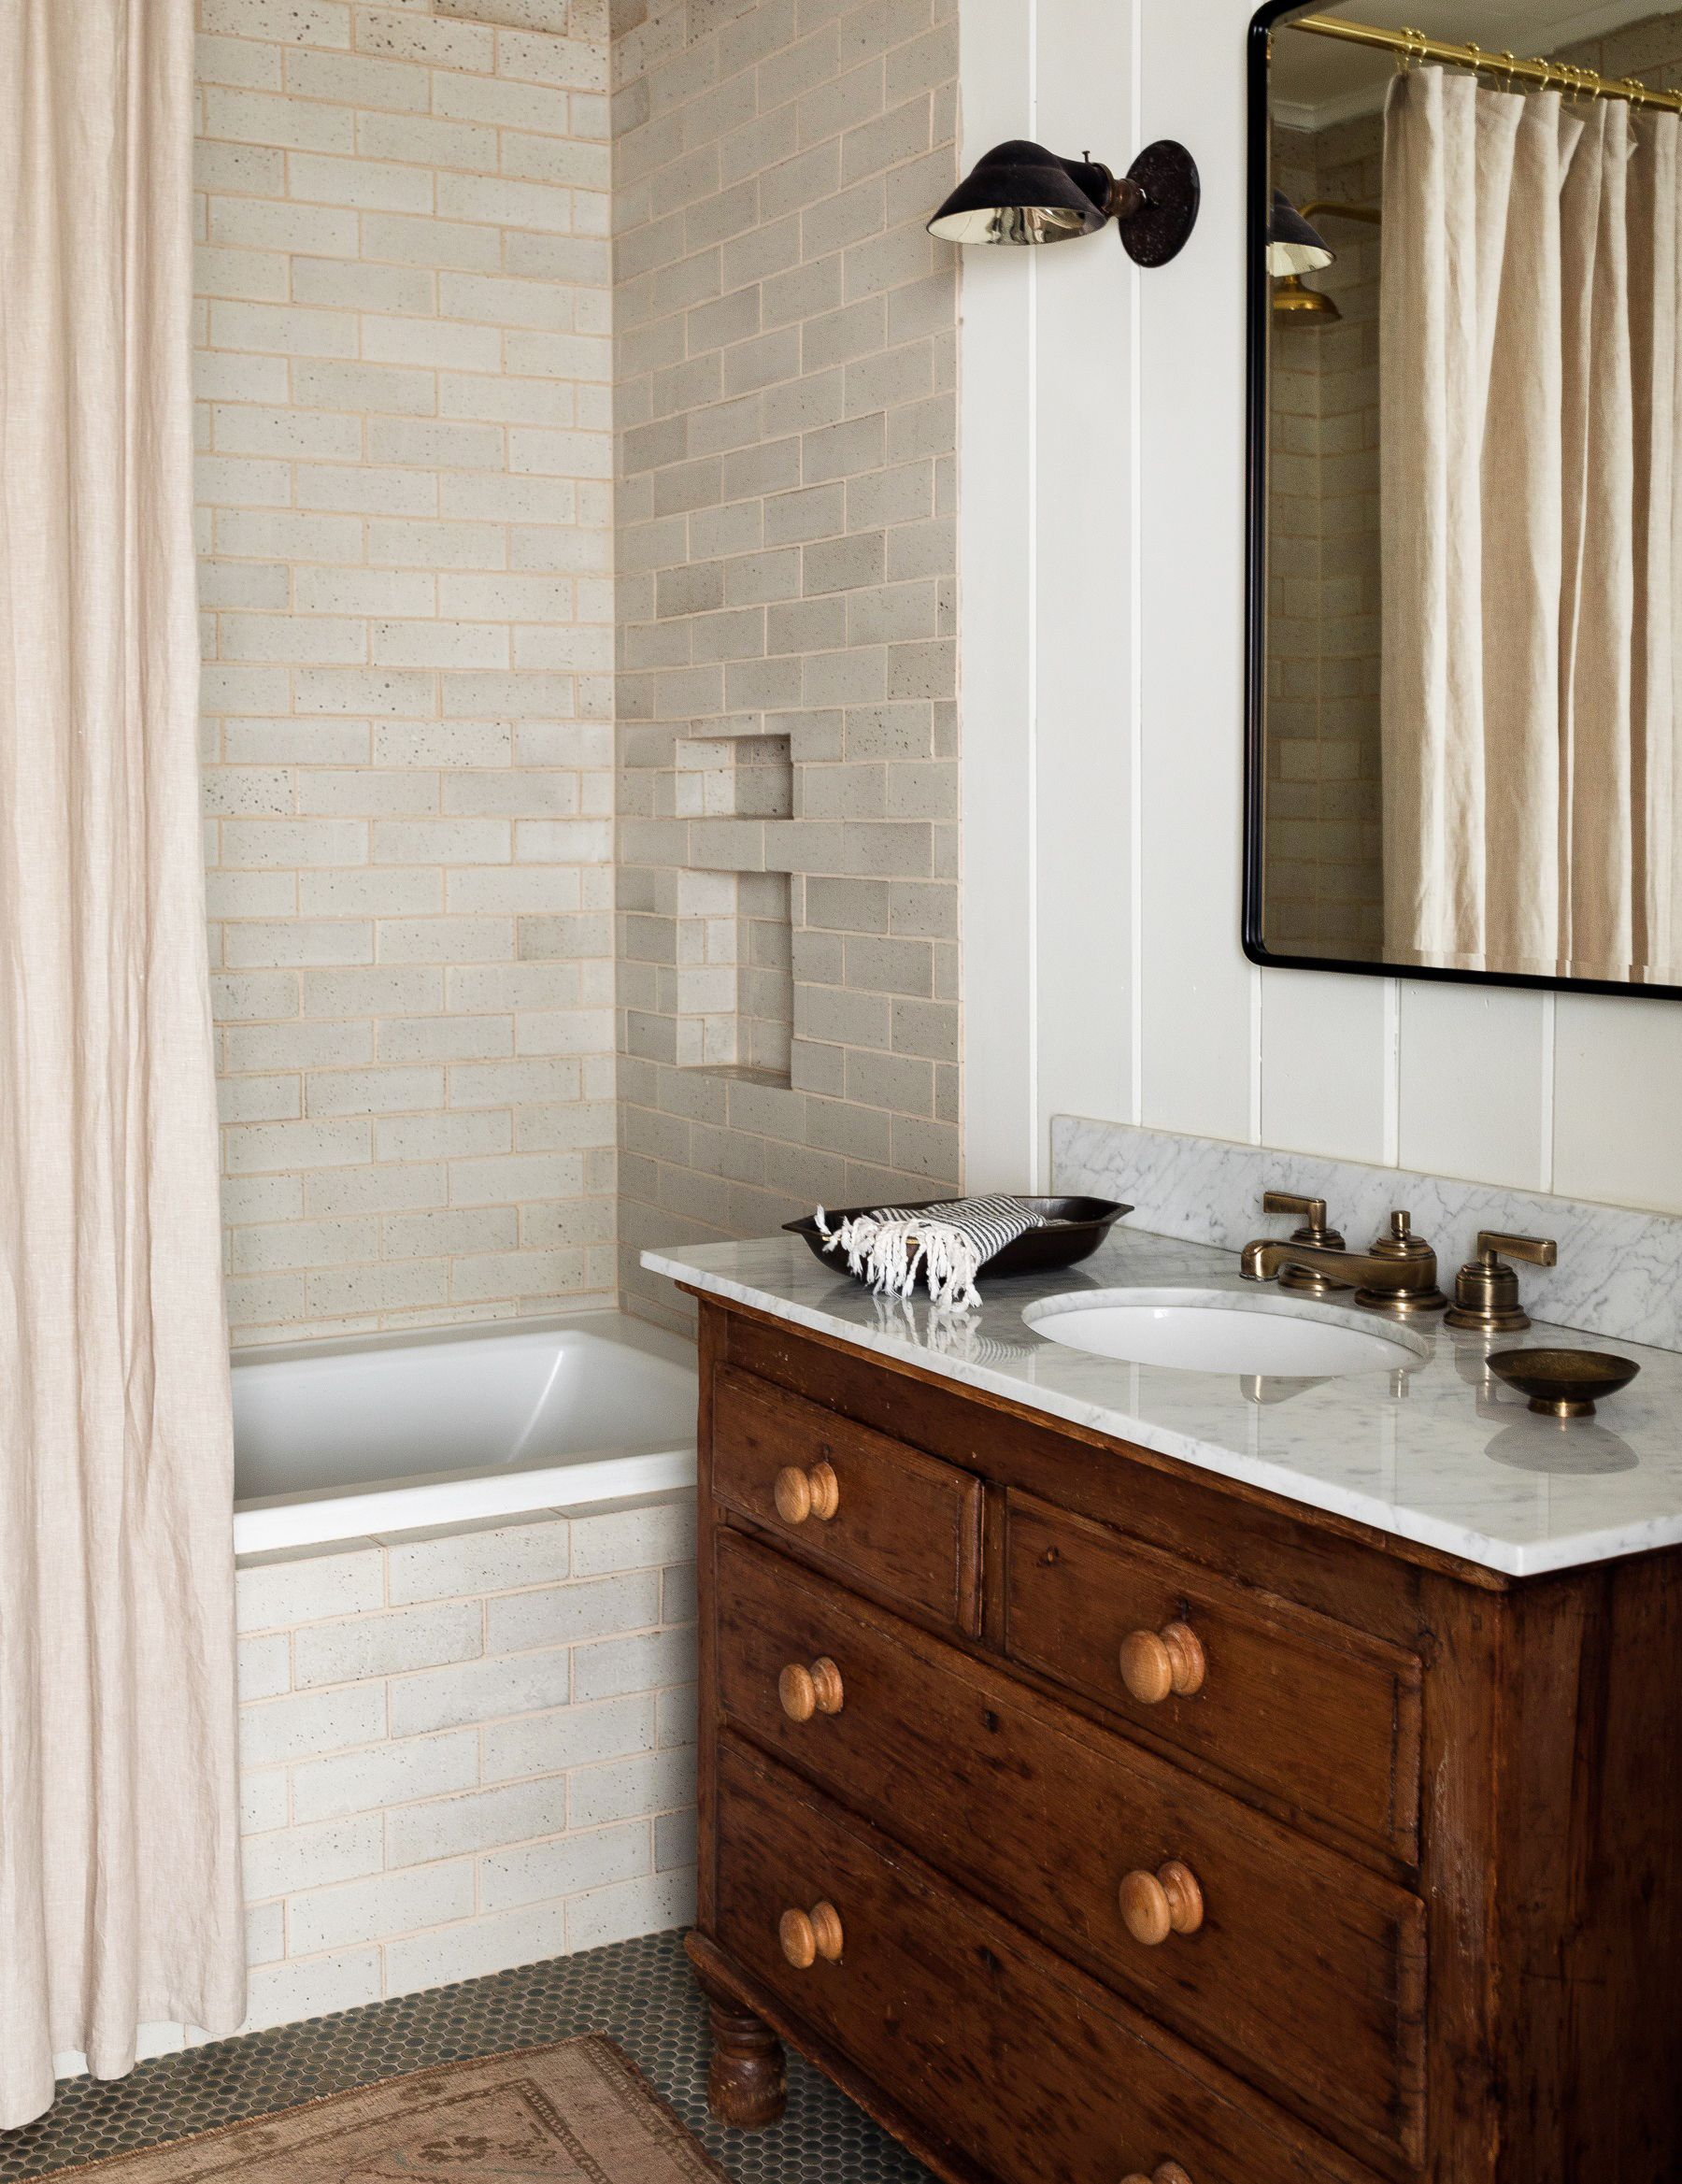 15 Best Subway Tile Bathroom Designs In 2019 Subway Tile